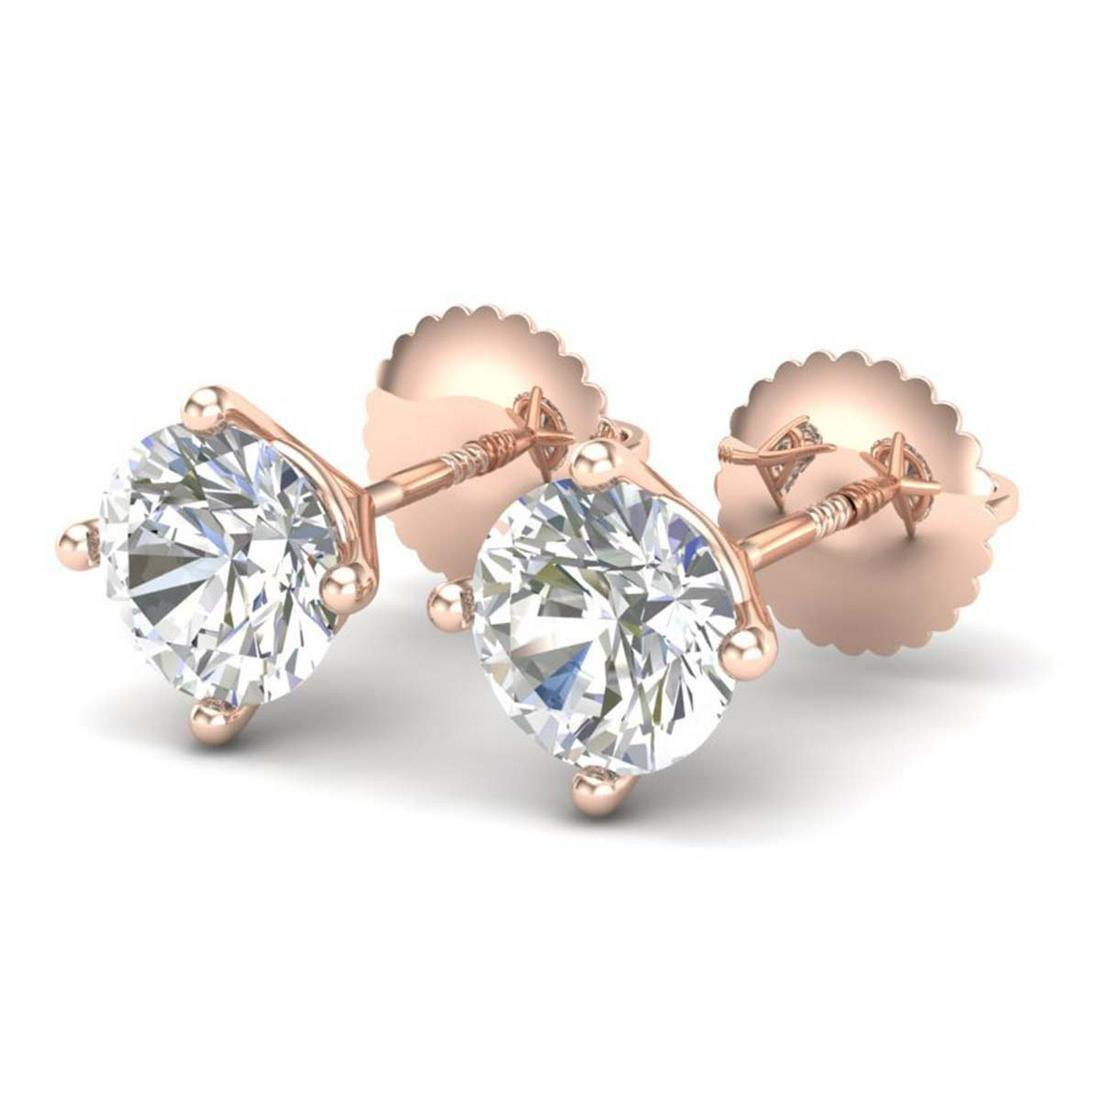 1.50 ctw VS/SI Diamond Solitaire Art Deco Stud Earrings